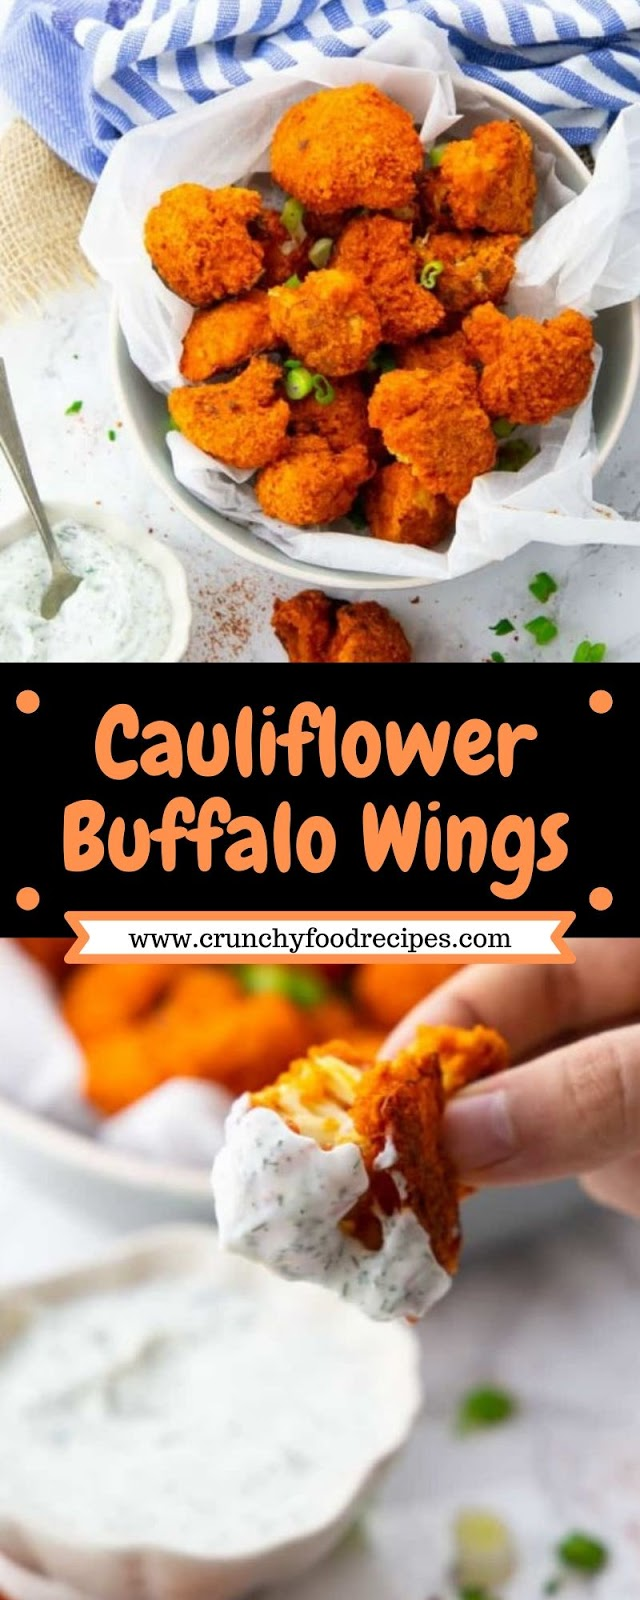 Cauliflower Buffalo Wings